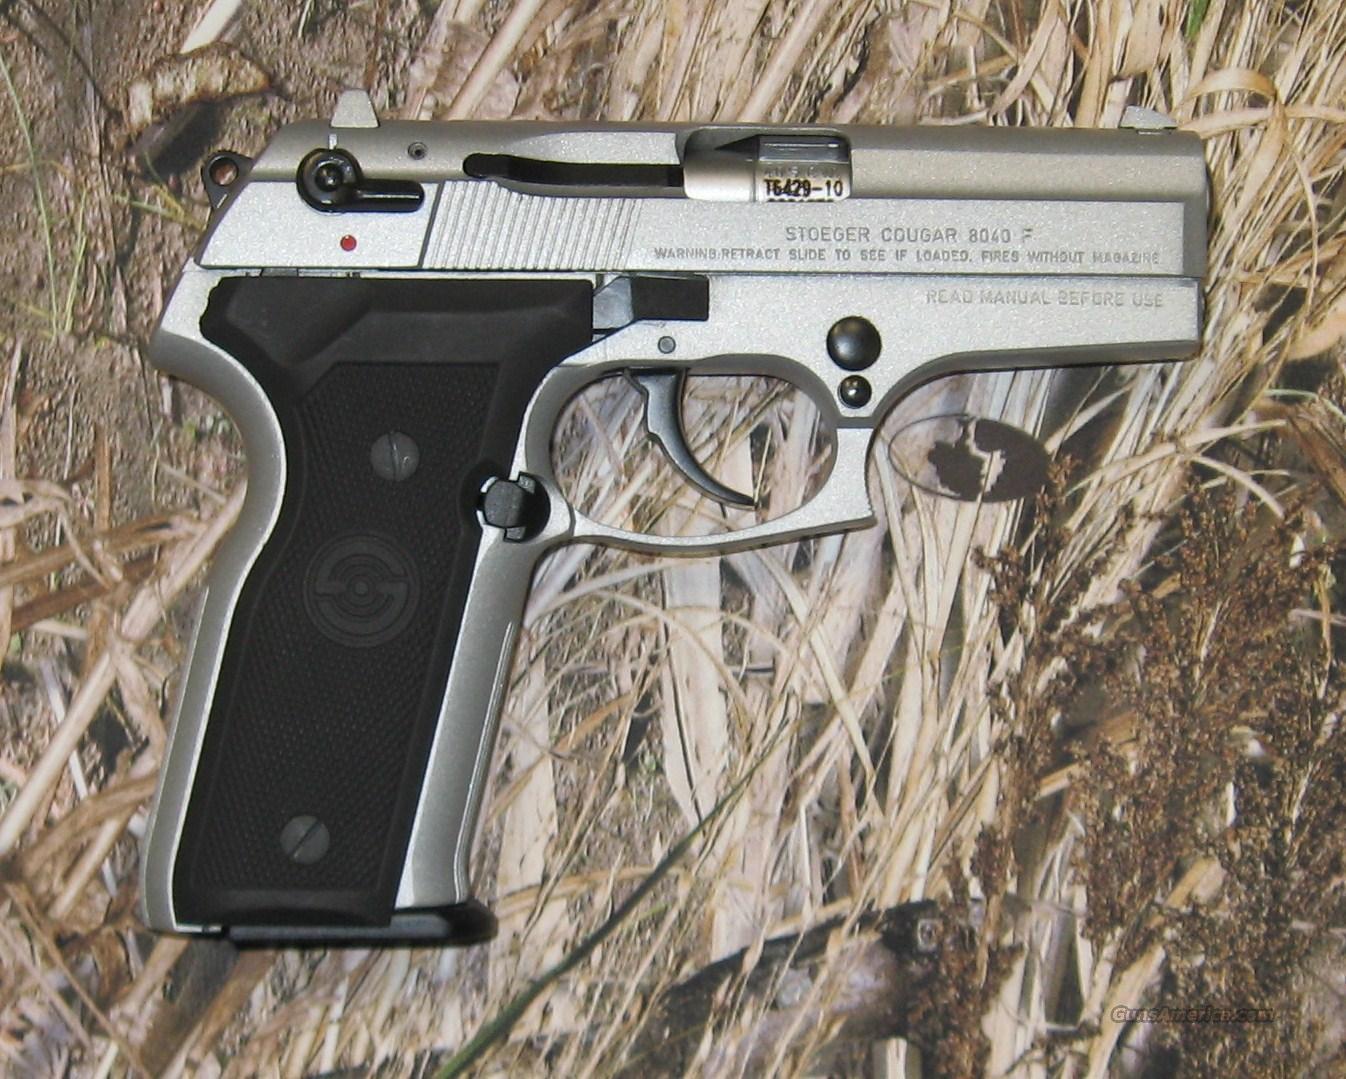 Stoeger cougar 8040f 40s amp w guns gt pistols gt s misc pistols